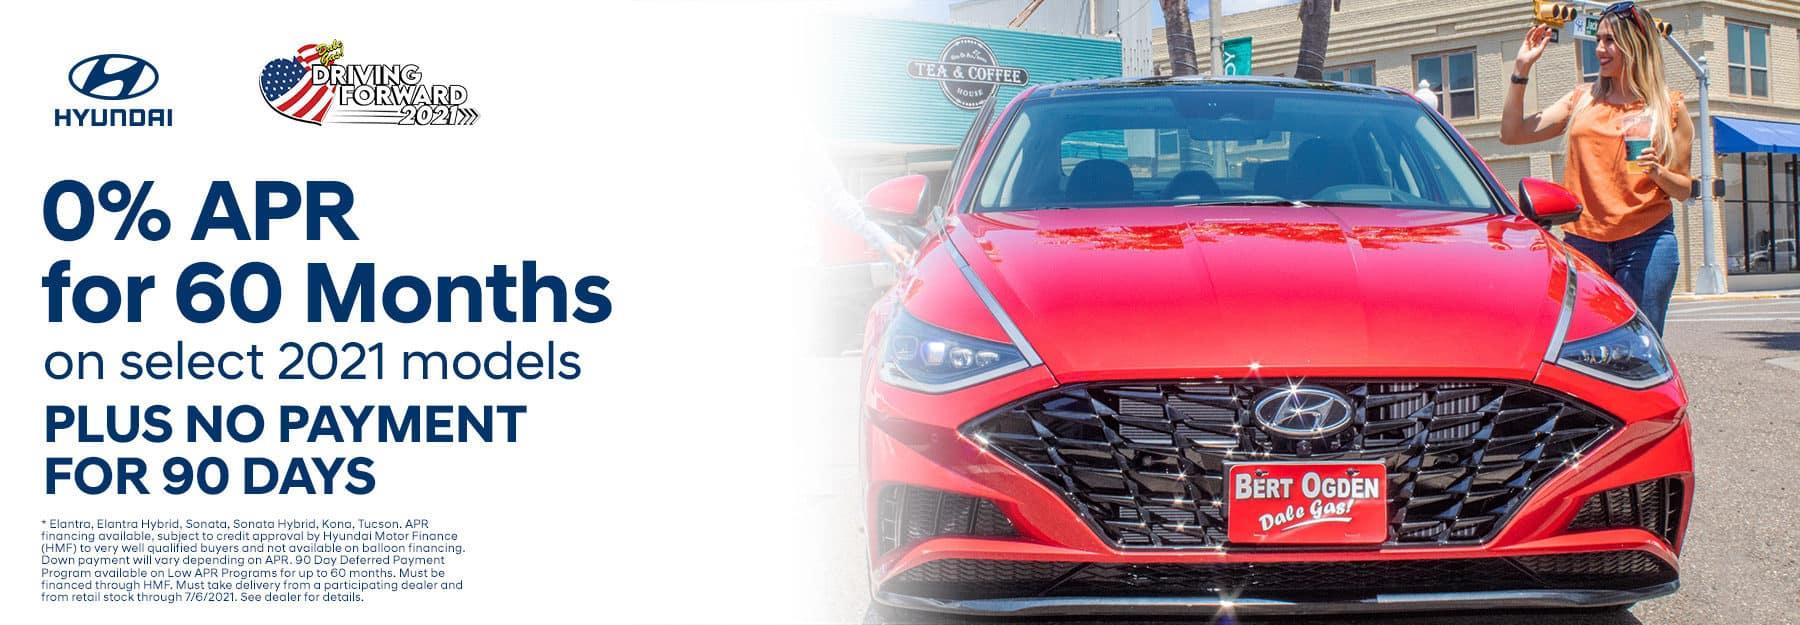 0% APR For 60 Months - Bert Ogden Harlingen Hyundai in Harlingen, Texas